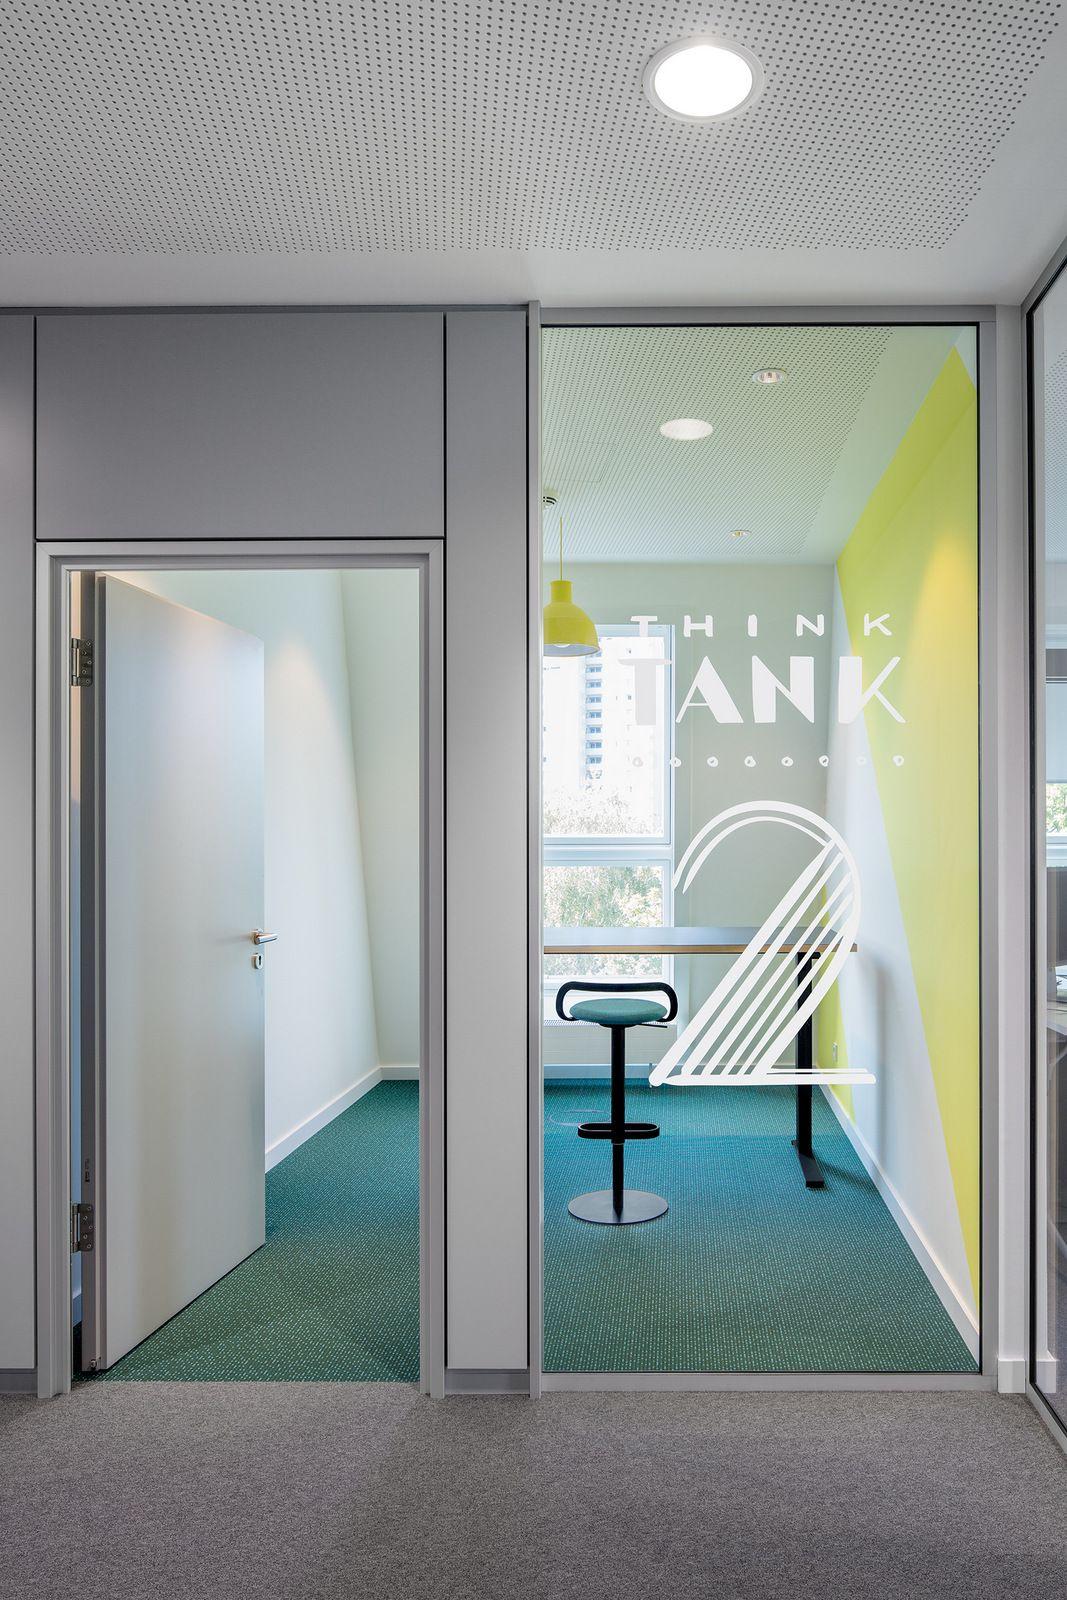 Body weakness seating active listening büro monday parat company office ideas